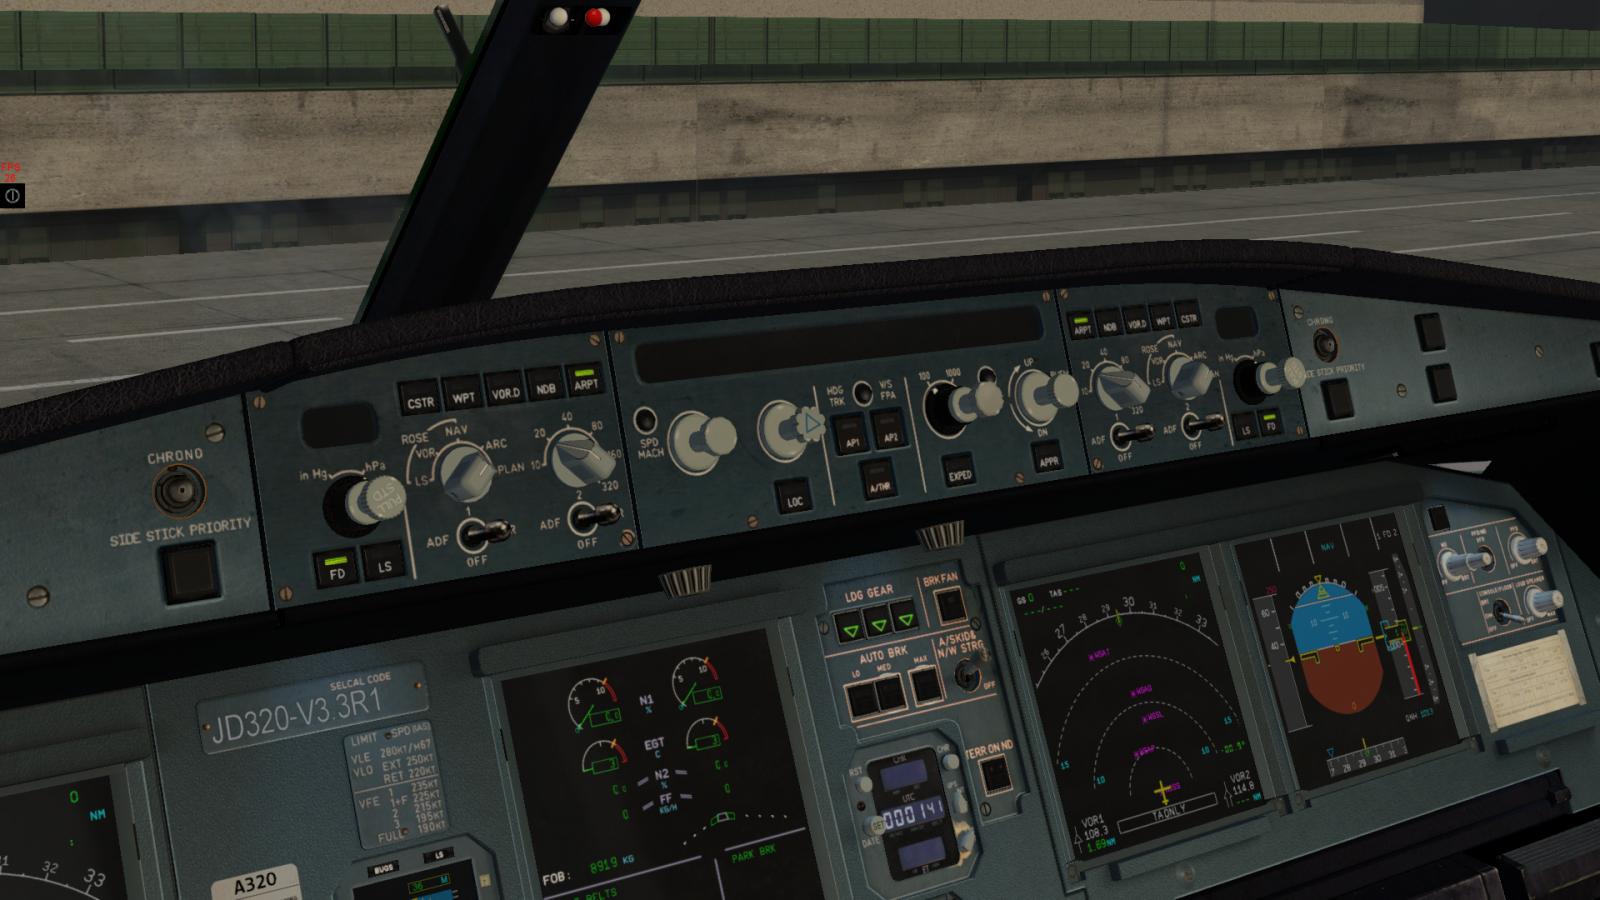 JAR A320 Autopilot not displaying anything! - General X-Plane Forum